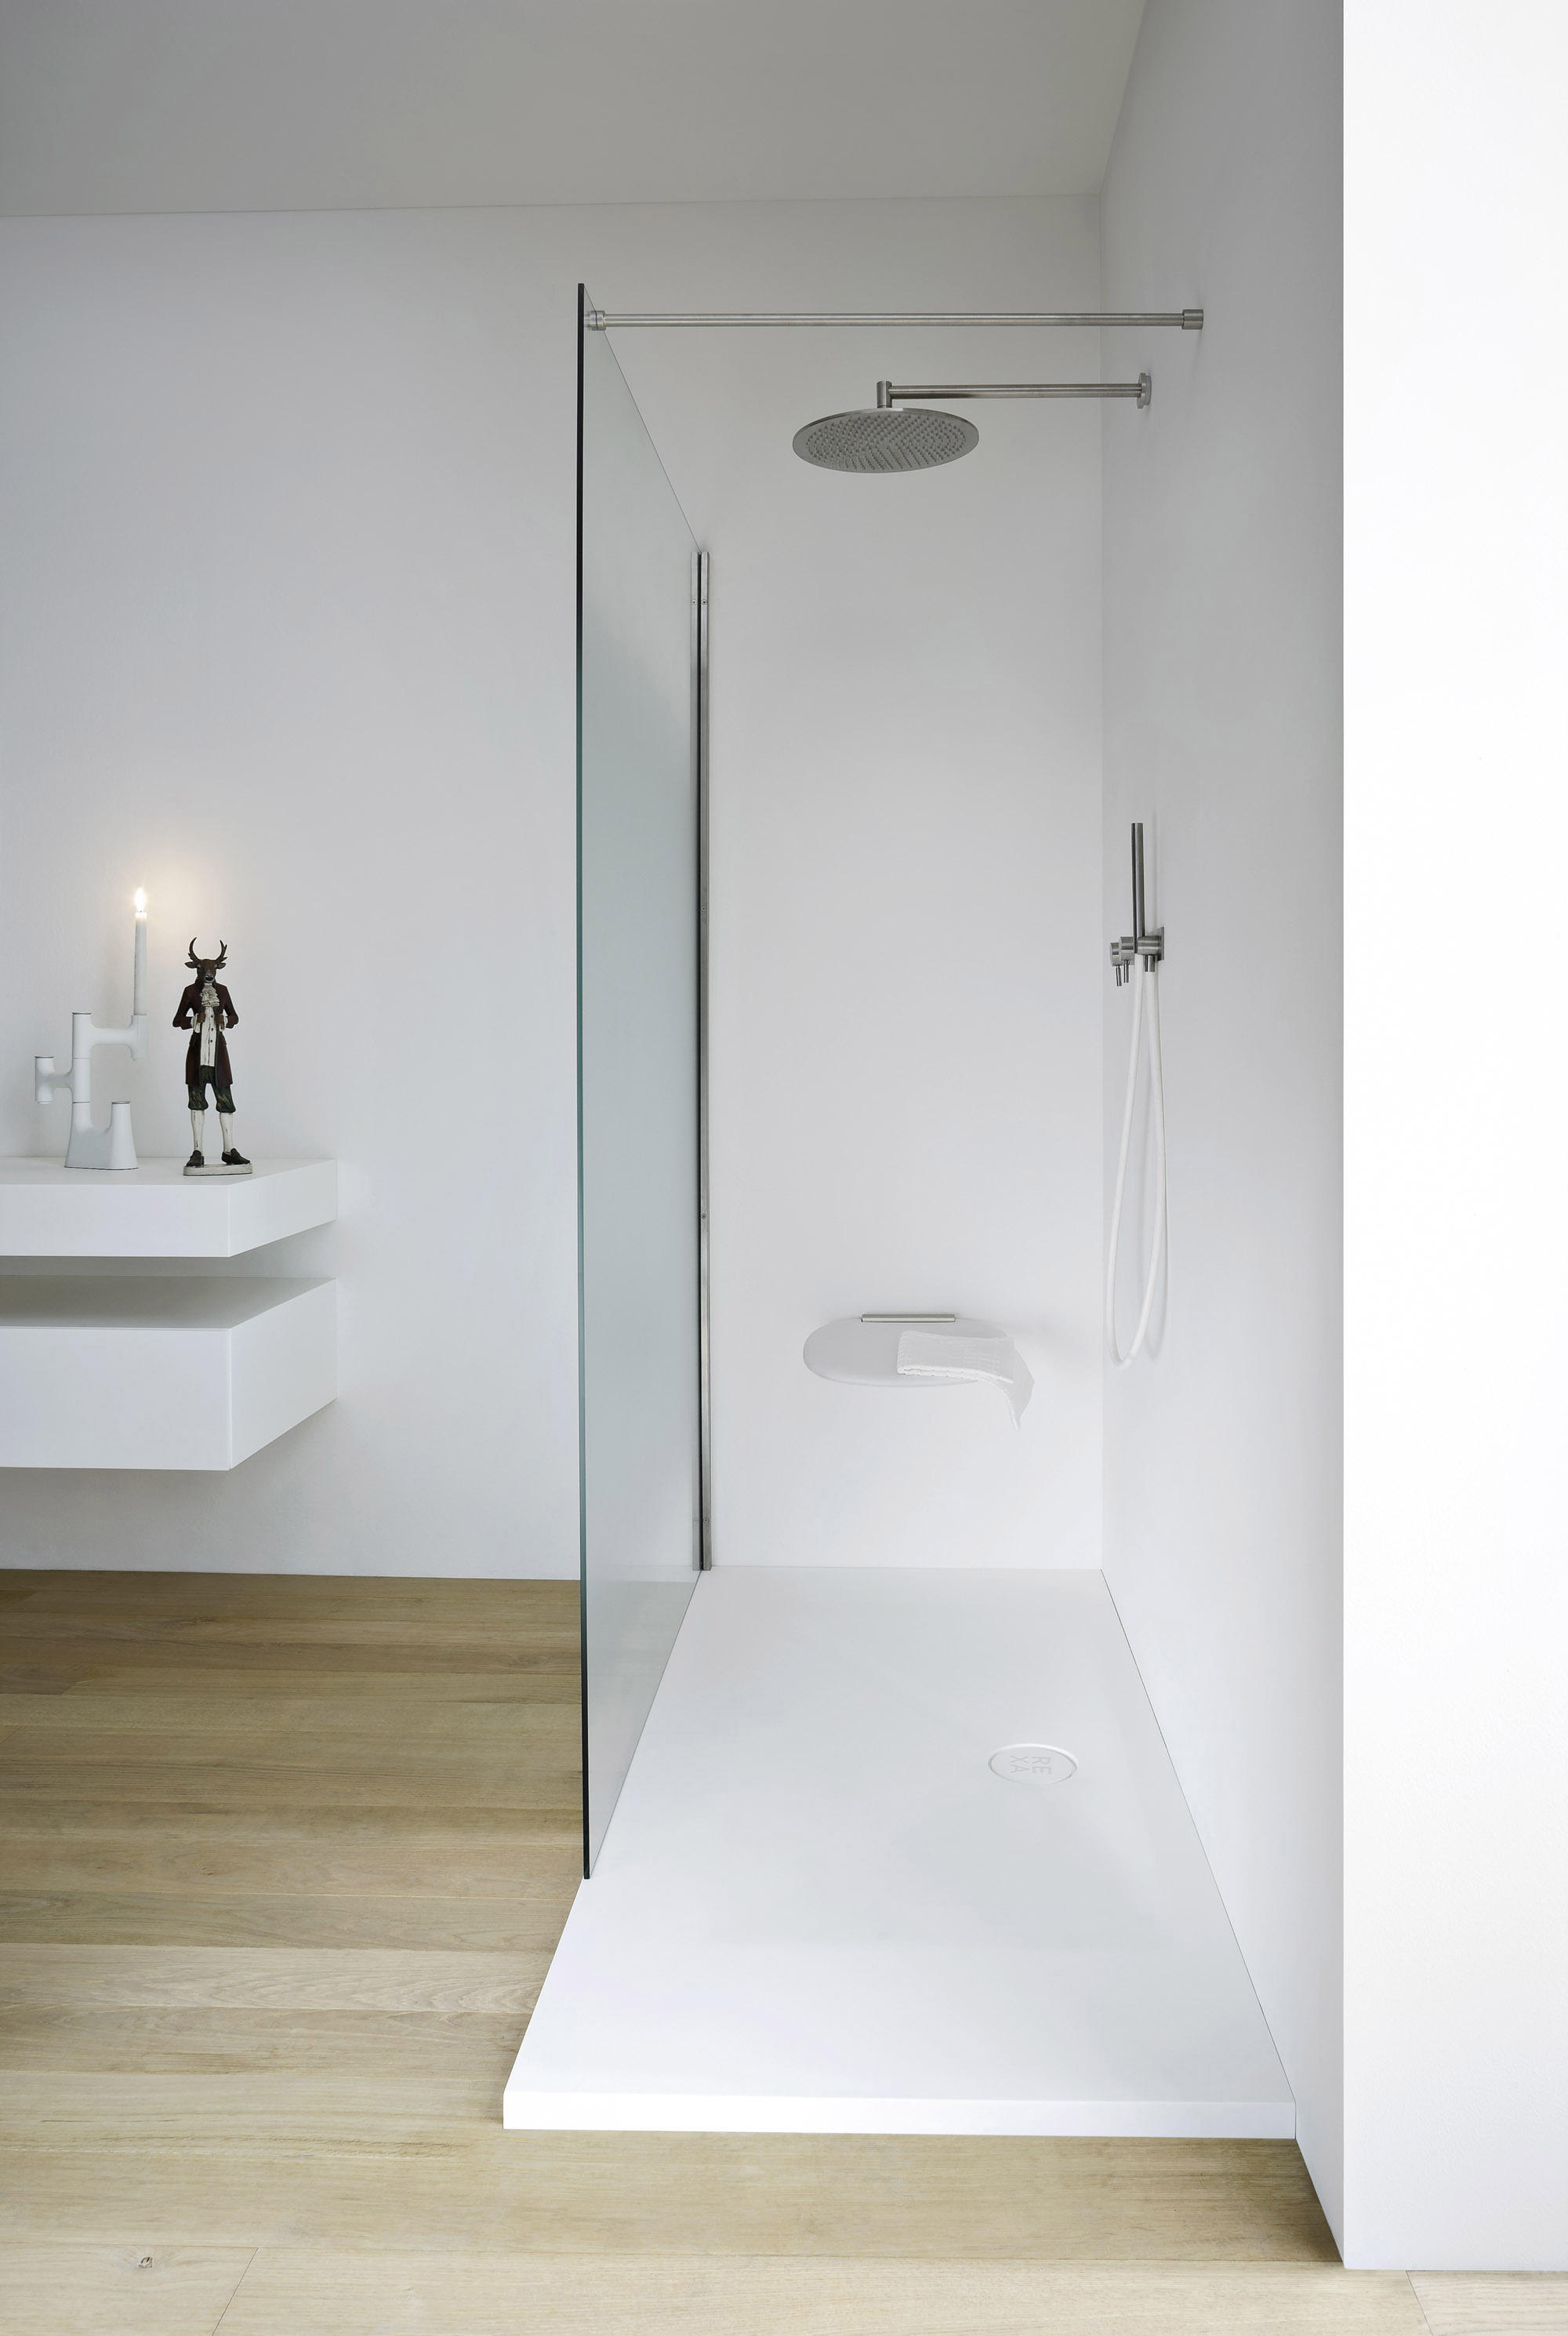 Unico douche receveur et fermeture pare douches de rexa for Layout bagno padronale con cabina doccia